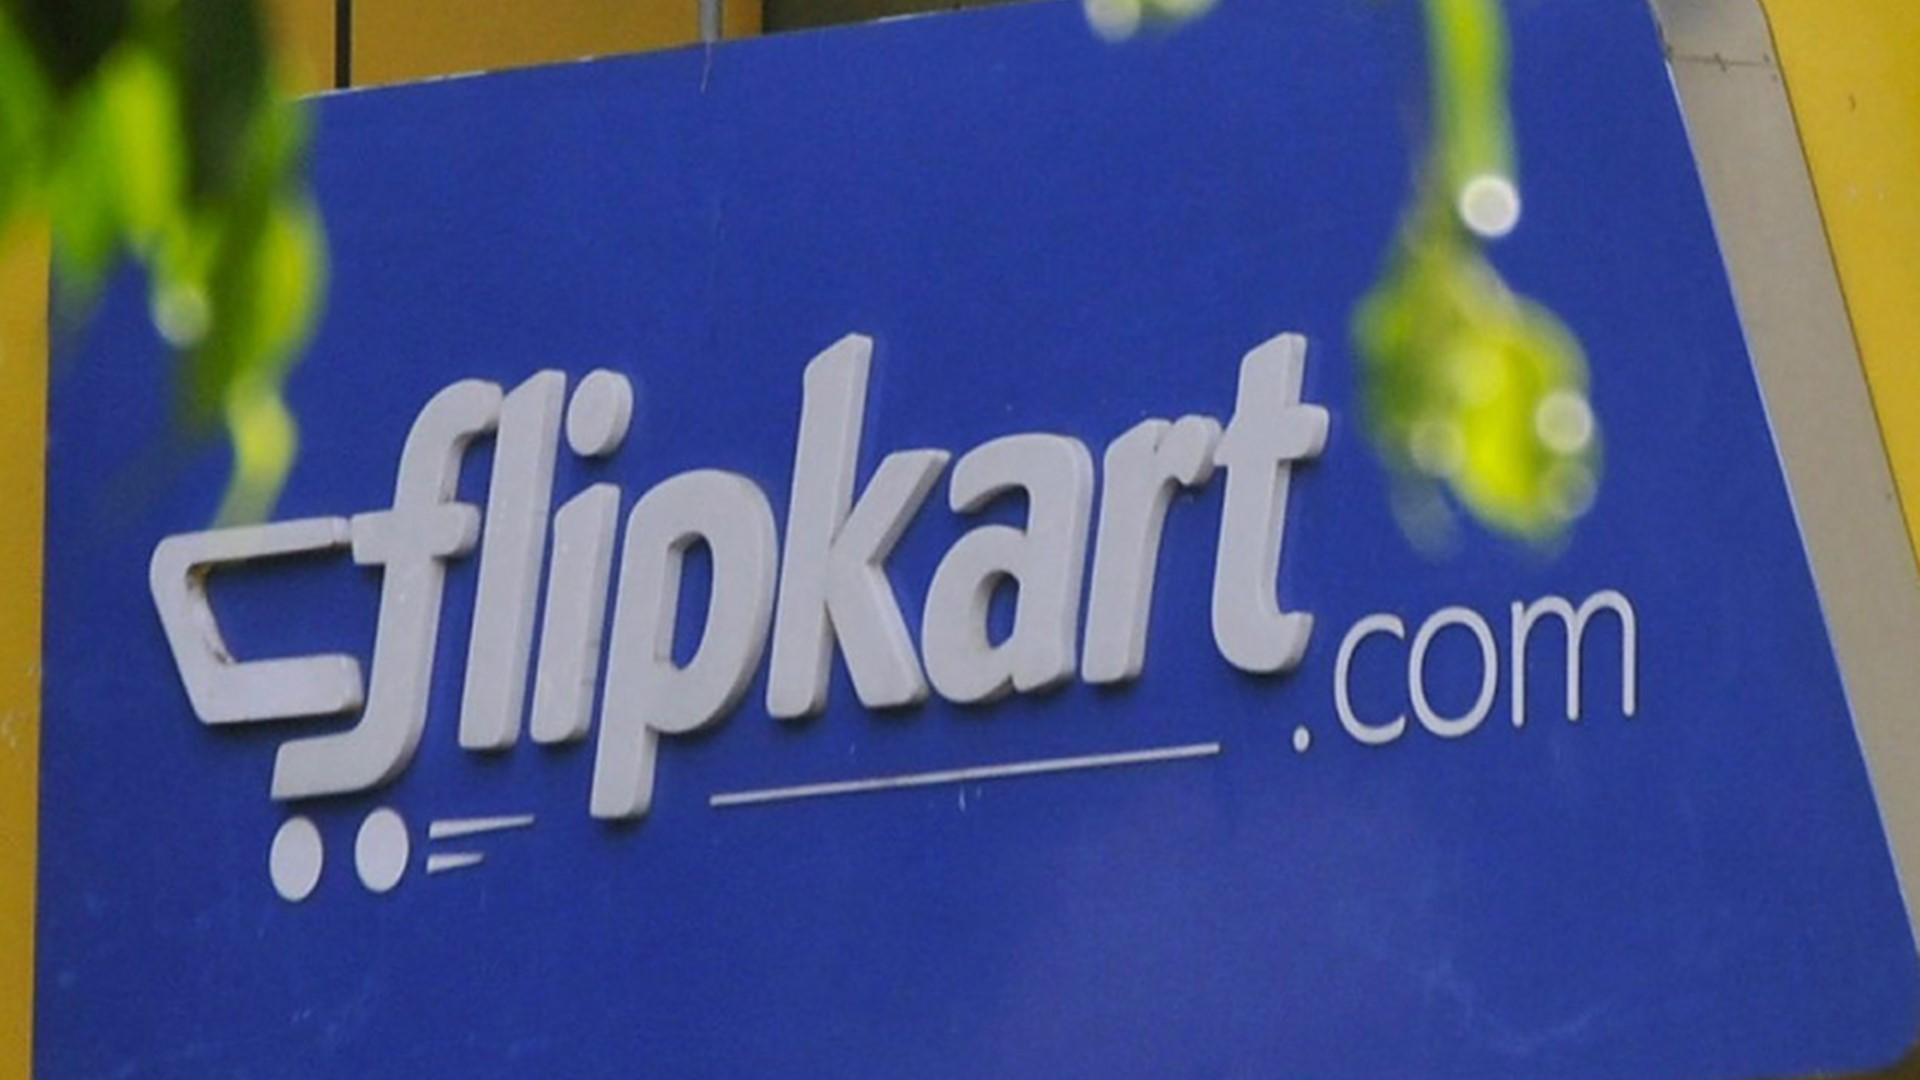 Walmart owned Flipkart to enter video streaming service in